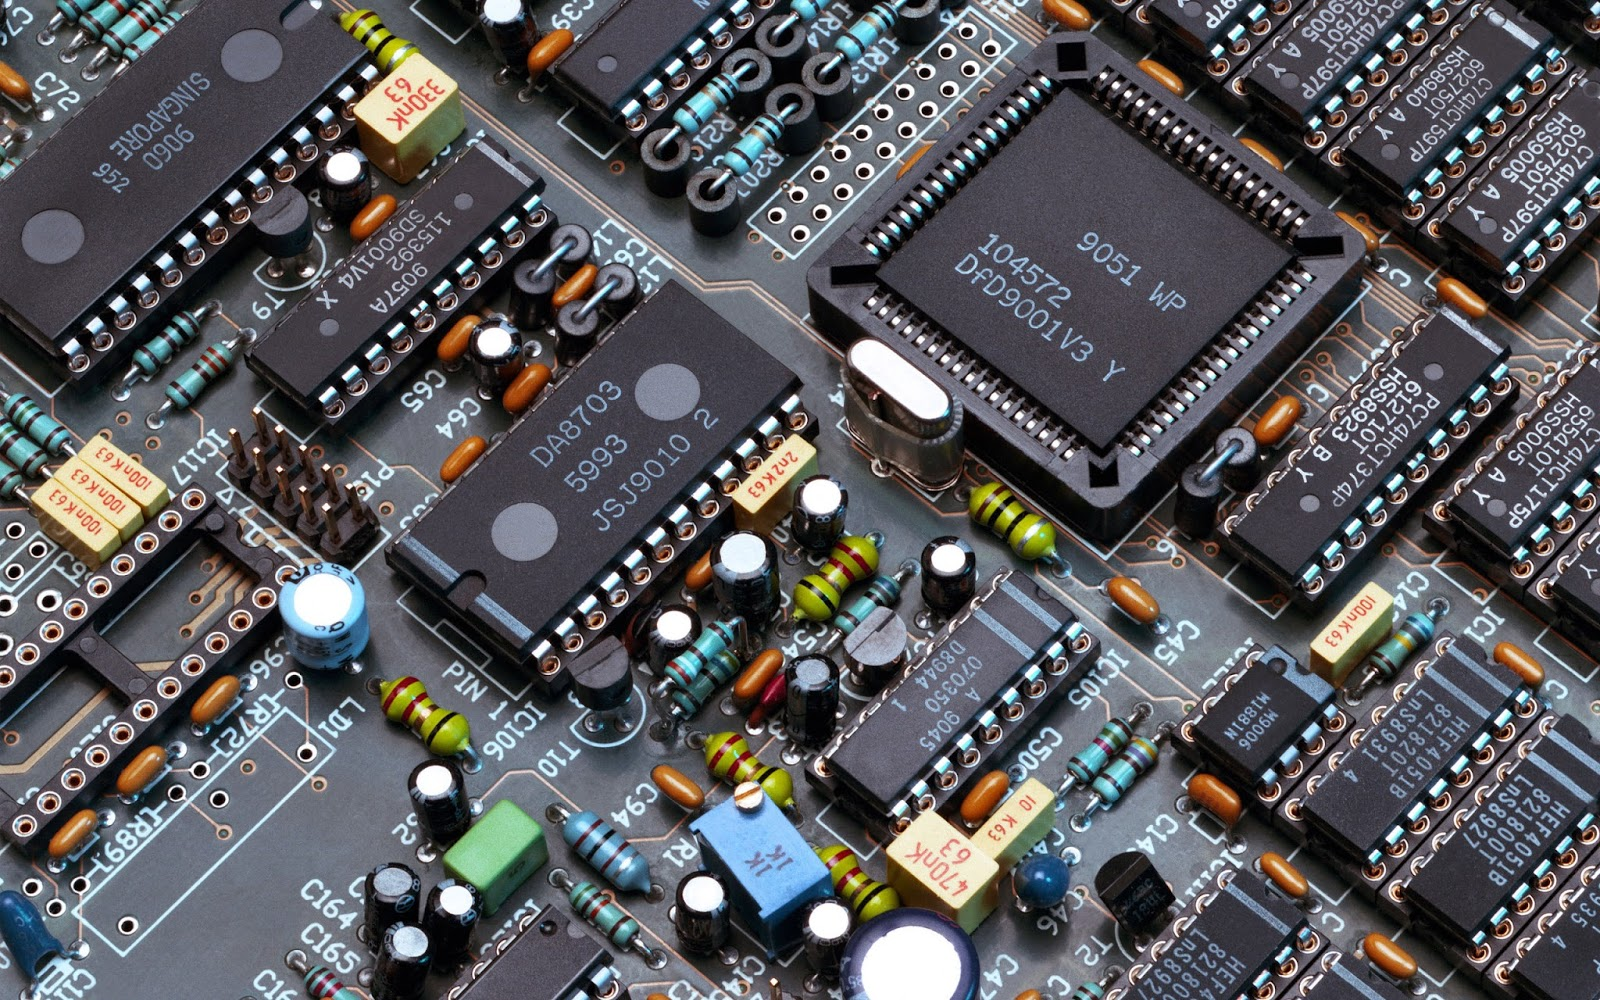 Circuito Electronico : Crucigrama sobre circuitos eléctricos y electrónicos de